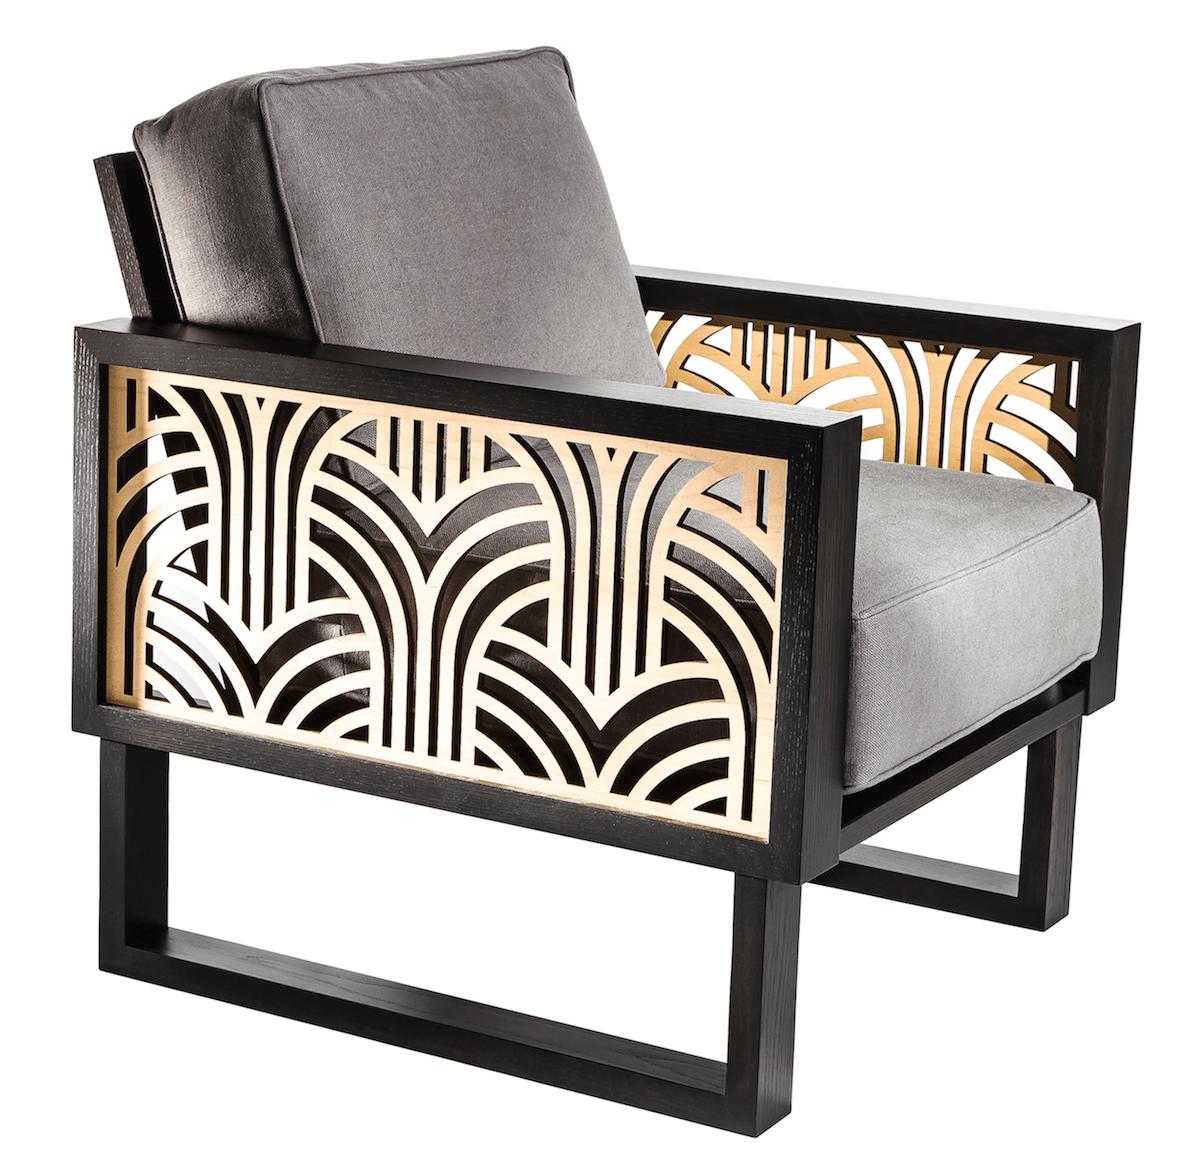 An Art Deco Lounge Chair Gray Twist Modern Deco Chairs Art Deco Chair Deco Furniture